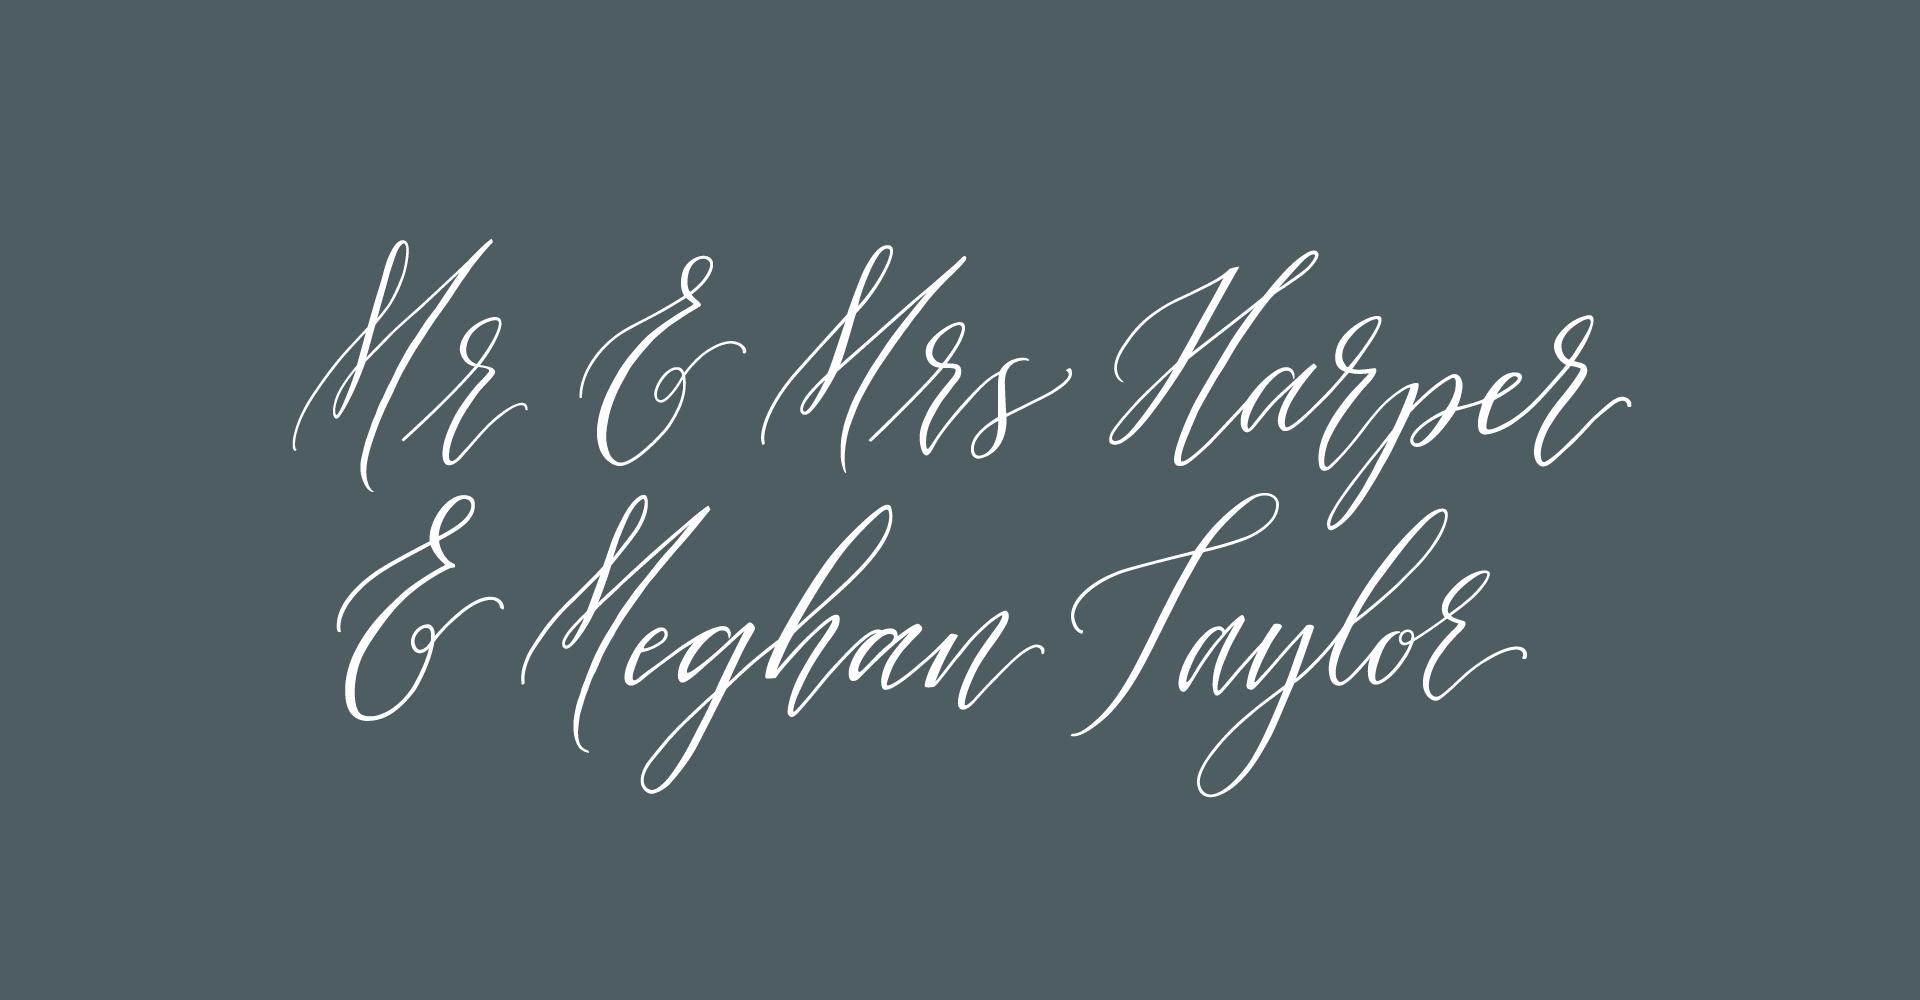 mathilda-lundin-calligraphy-bohemian-elegance.png